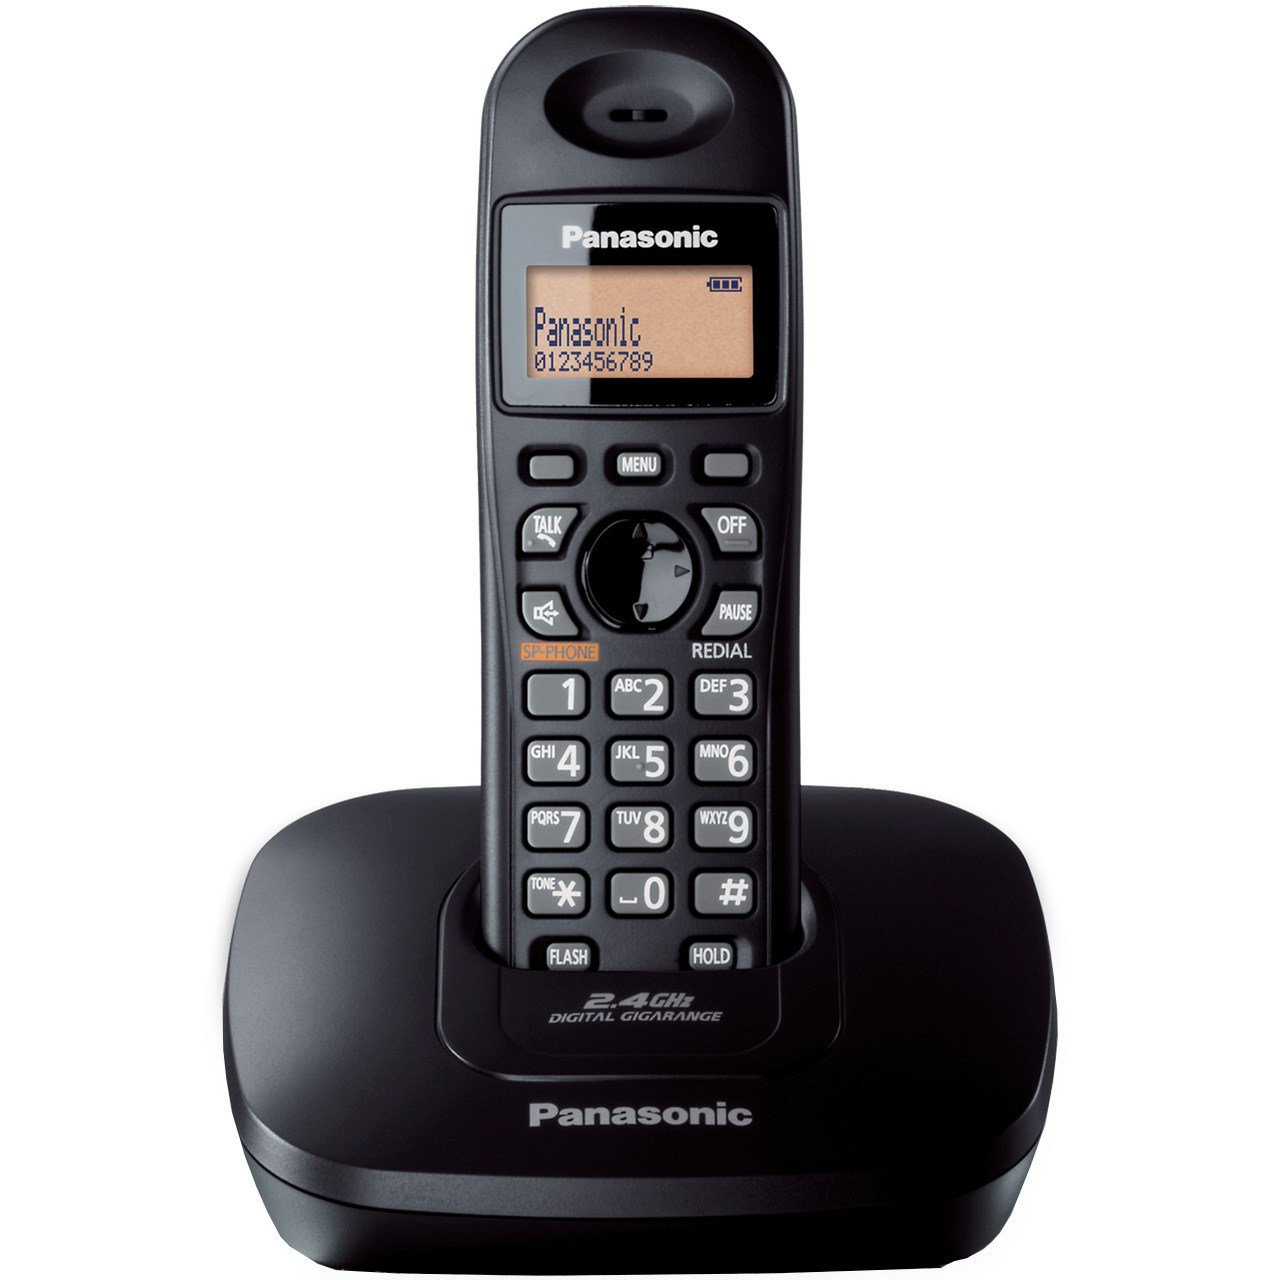 main images تلفن بی سیم پاناسونیک مدلPanasonic KX-TG3611BX Panasonic KX-TG3611BX Wireless Phone